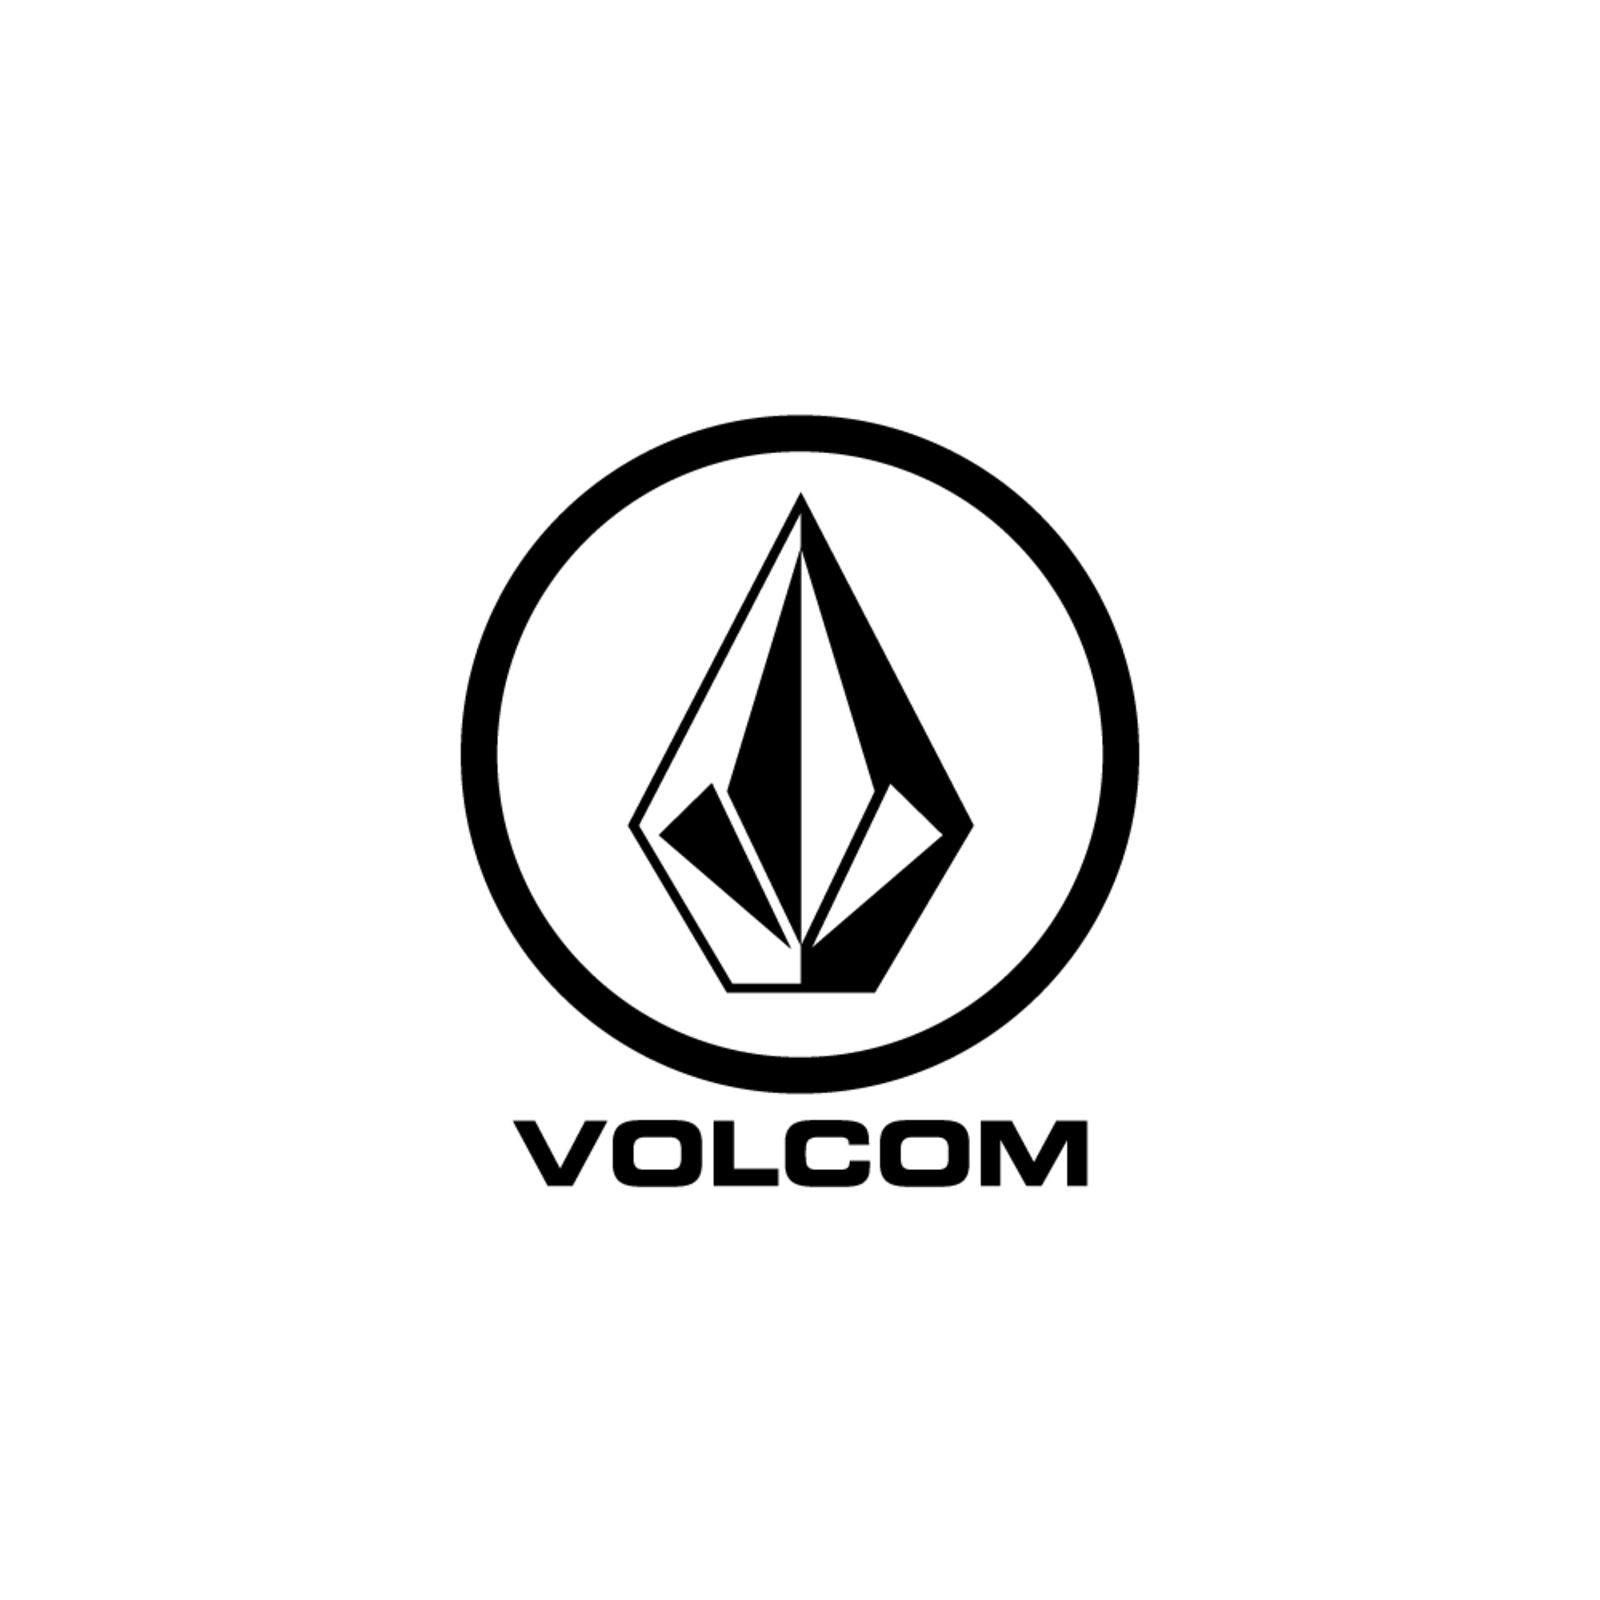 VOLCOM (Image 1)